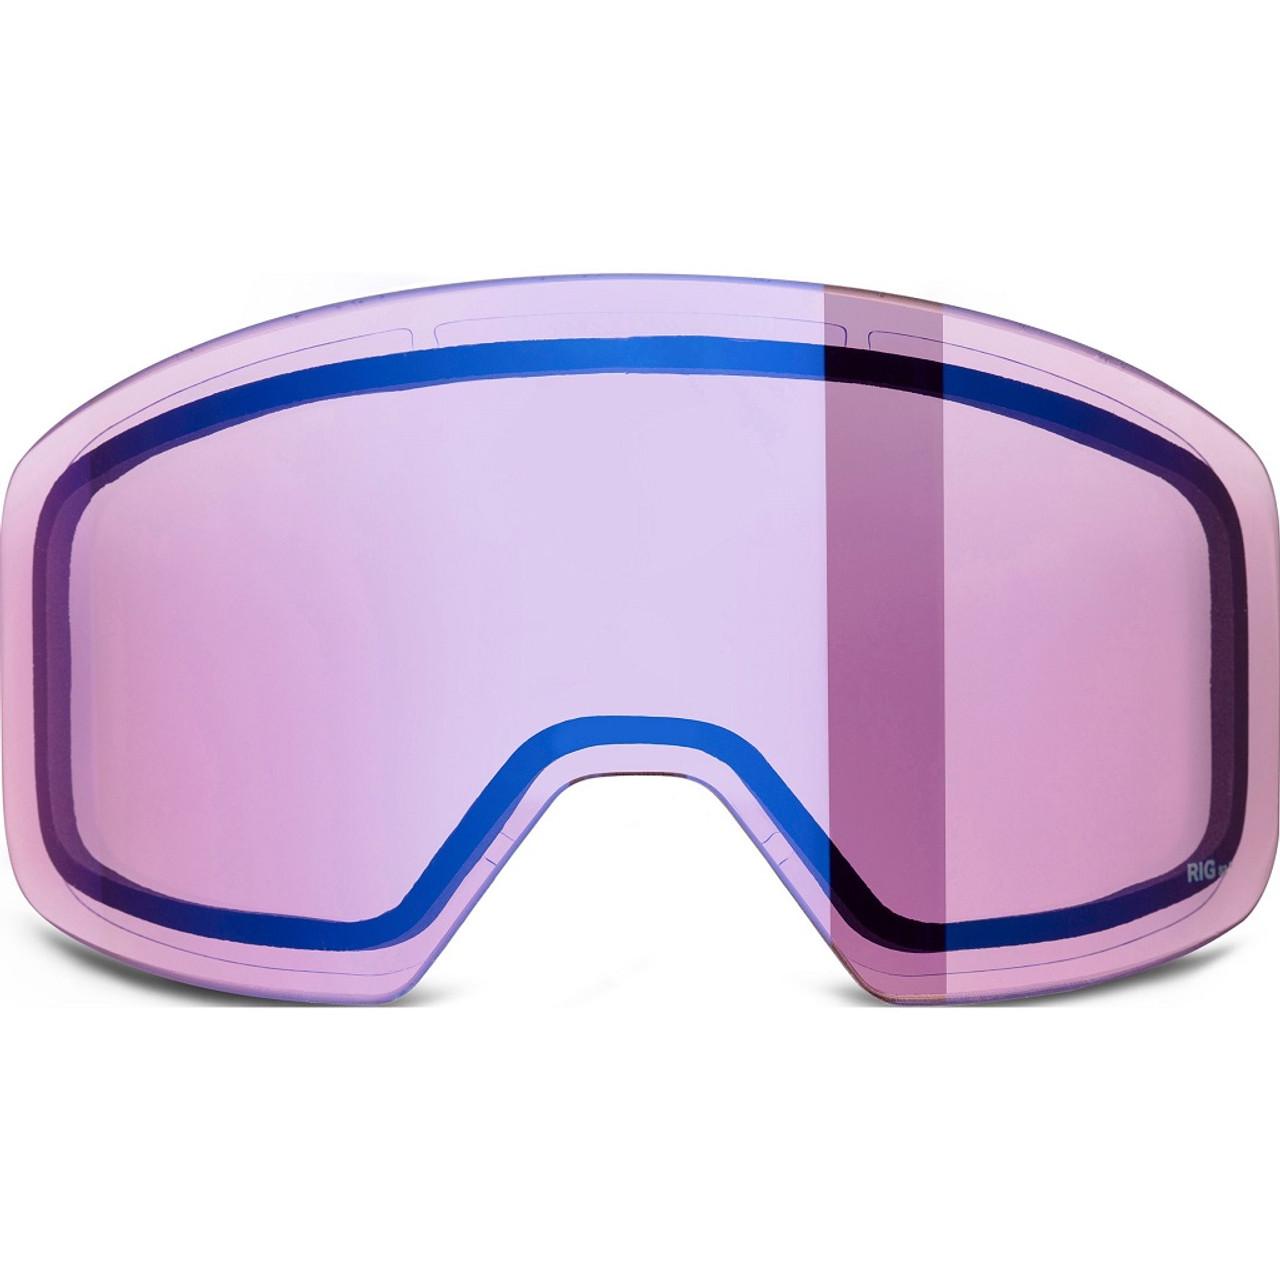 RIG Light Amethyst - Sweet Protection Boondock Lenses